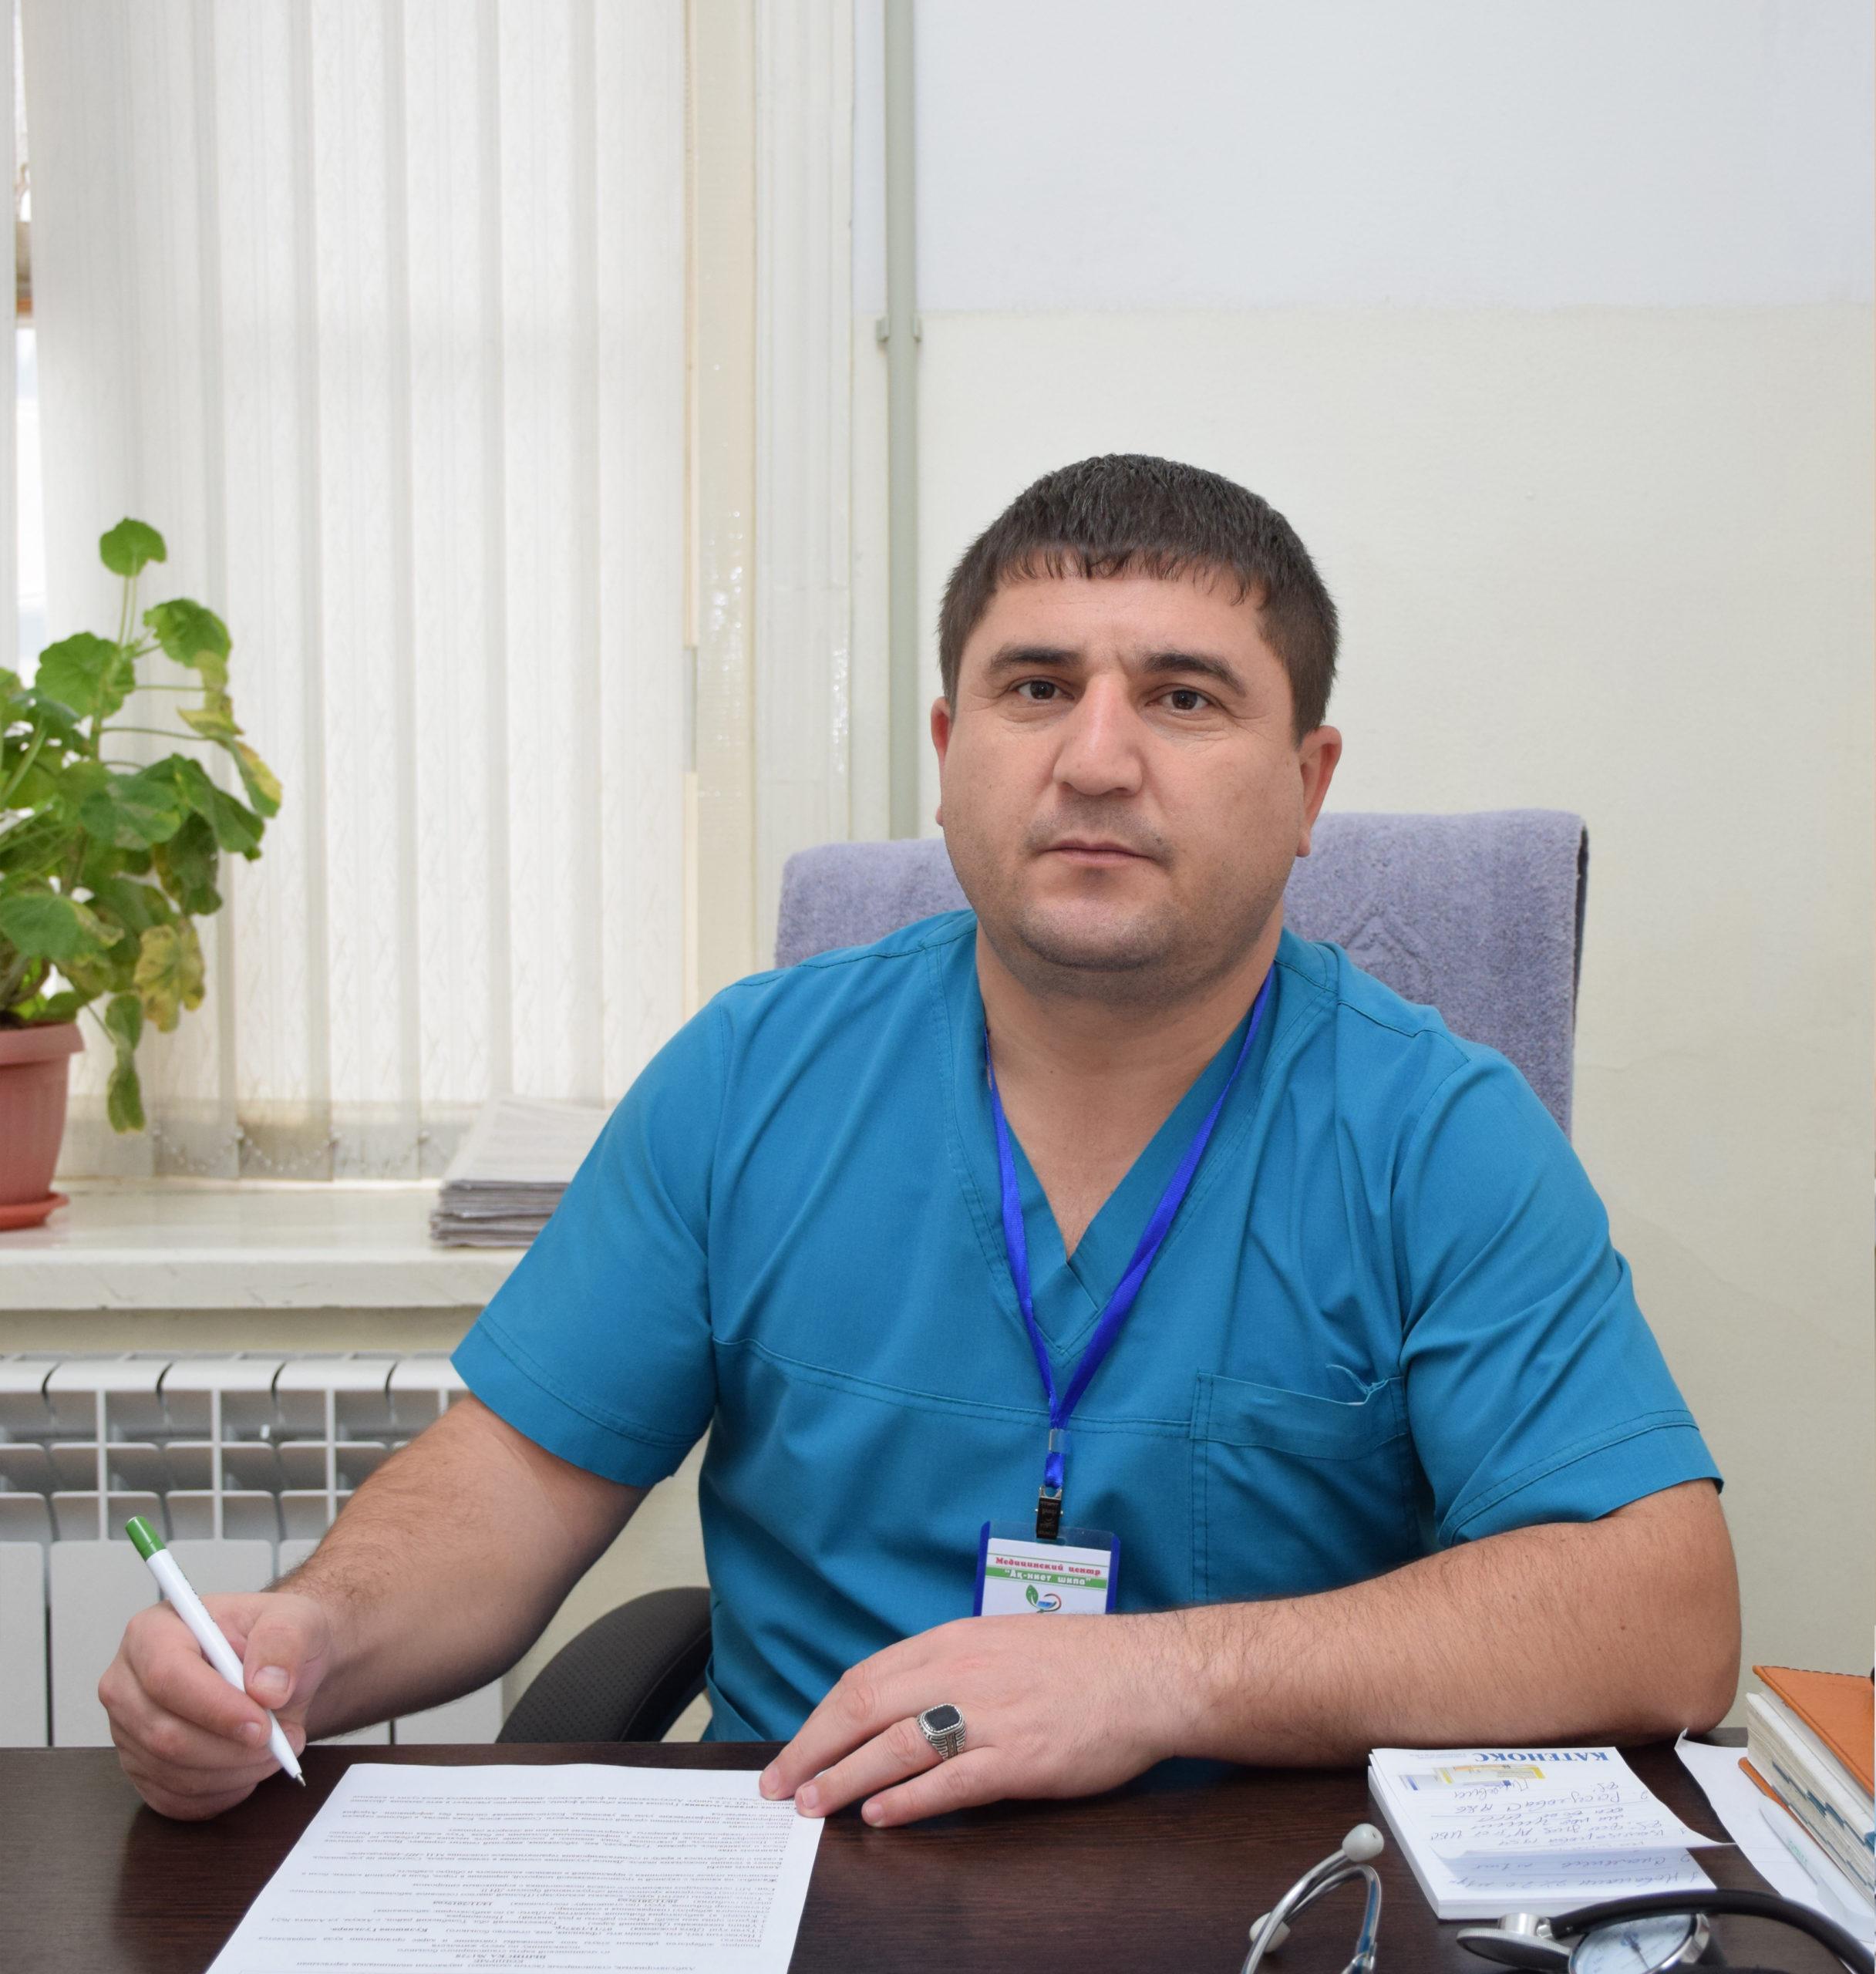 Врач клиники Akniet Shipa Сайрамский р-н. с. Карабулак